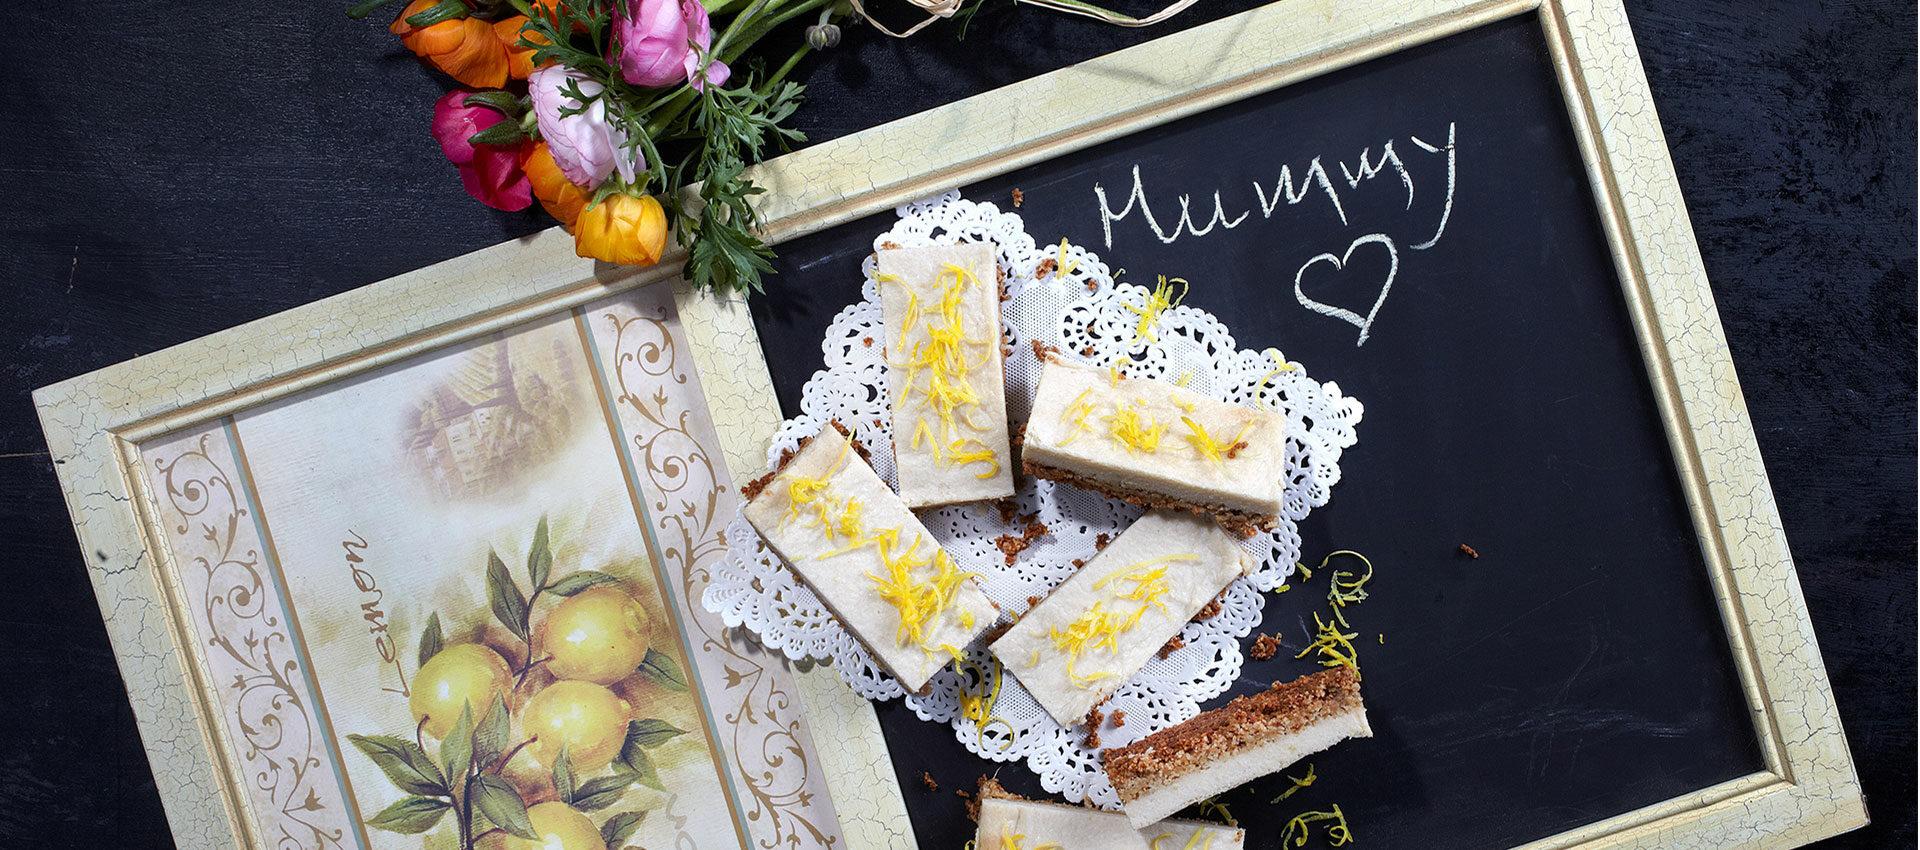 Violife Creamy lemon bars